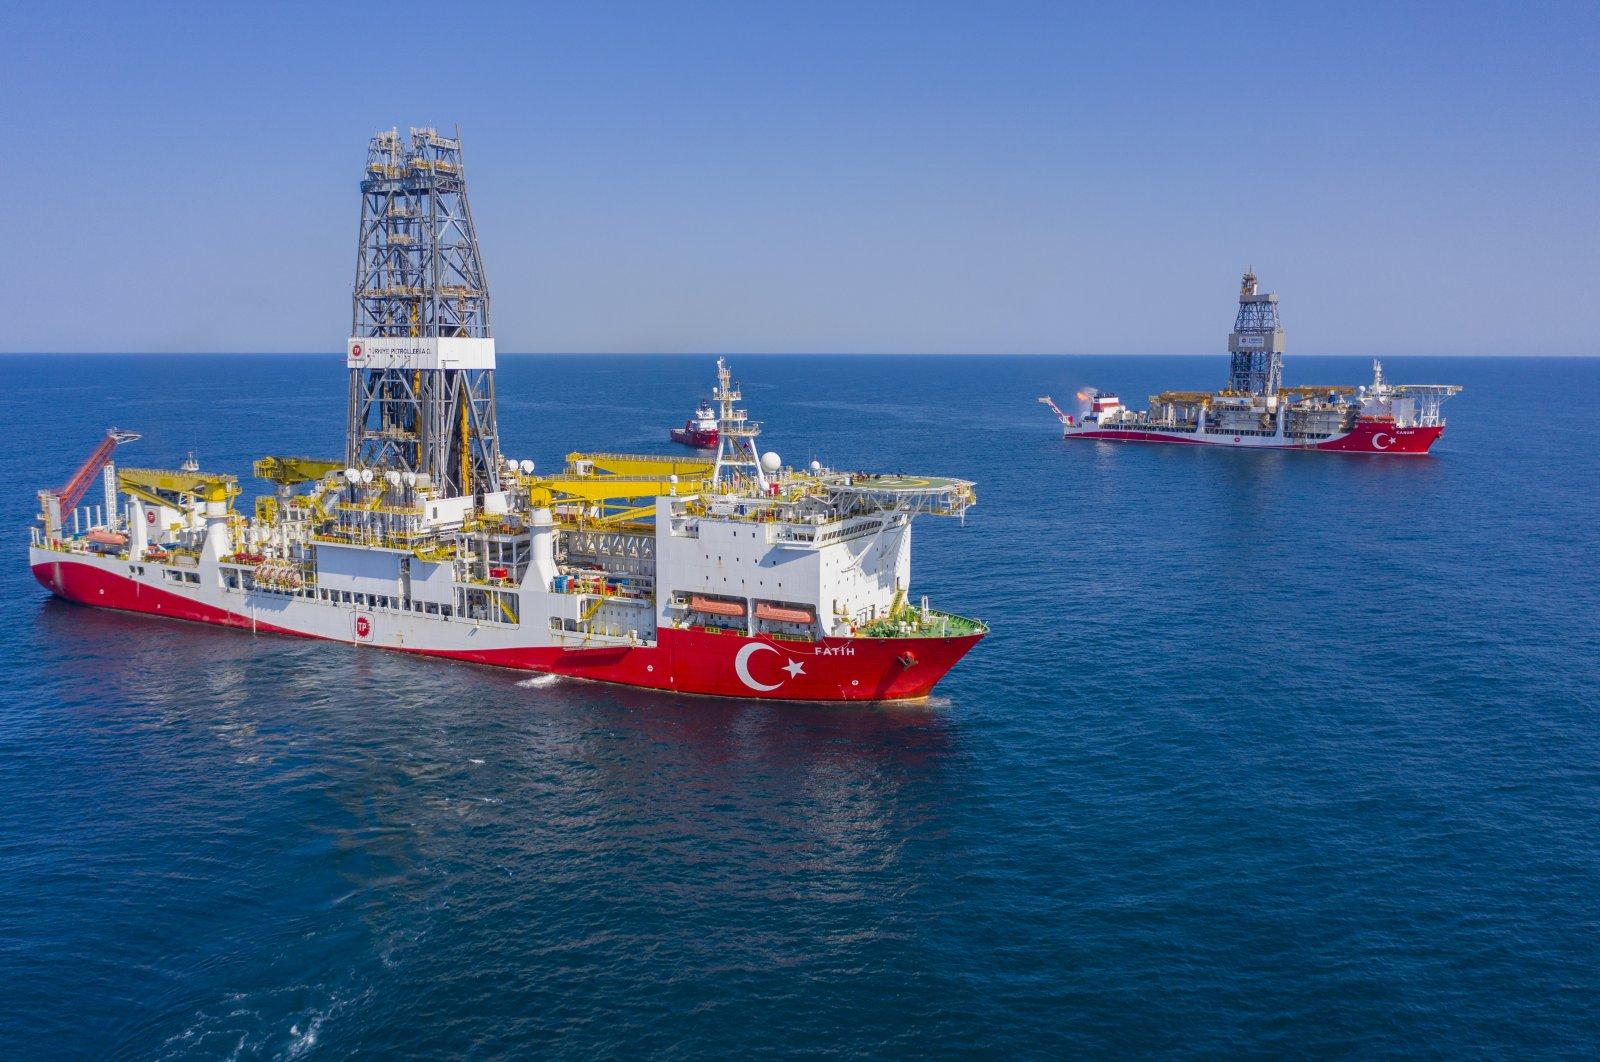 Turkey's Fatih (L) and Kanuni drillships are seen in the Sakarya gas field in the Black Sea, Turkey, July 29, 2021. (AA Photo)